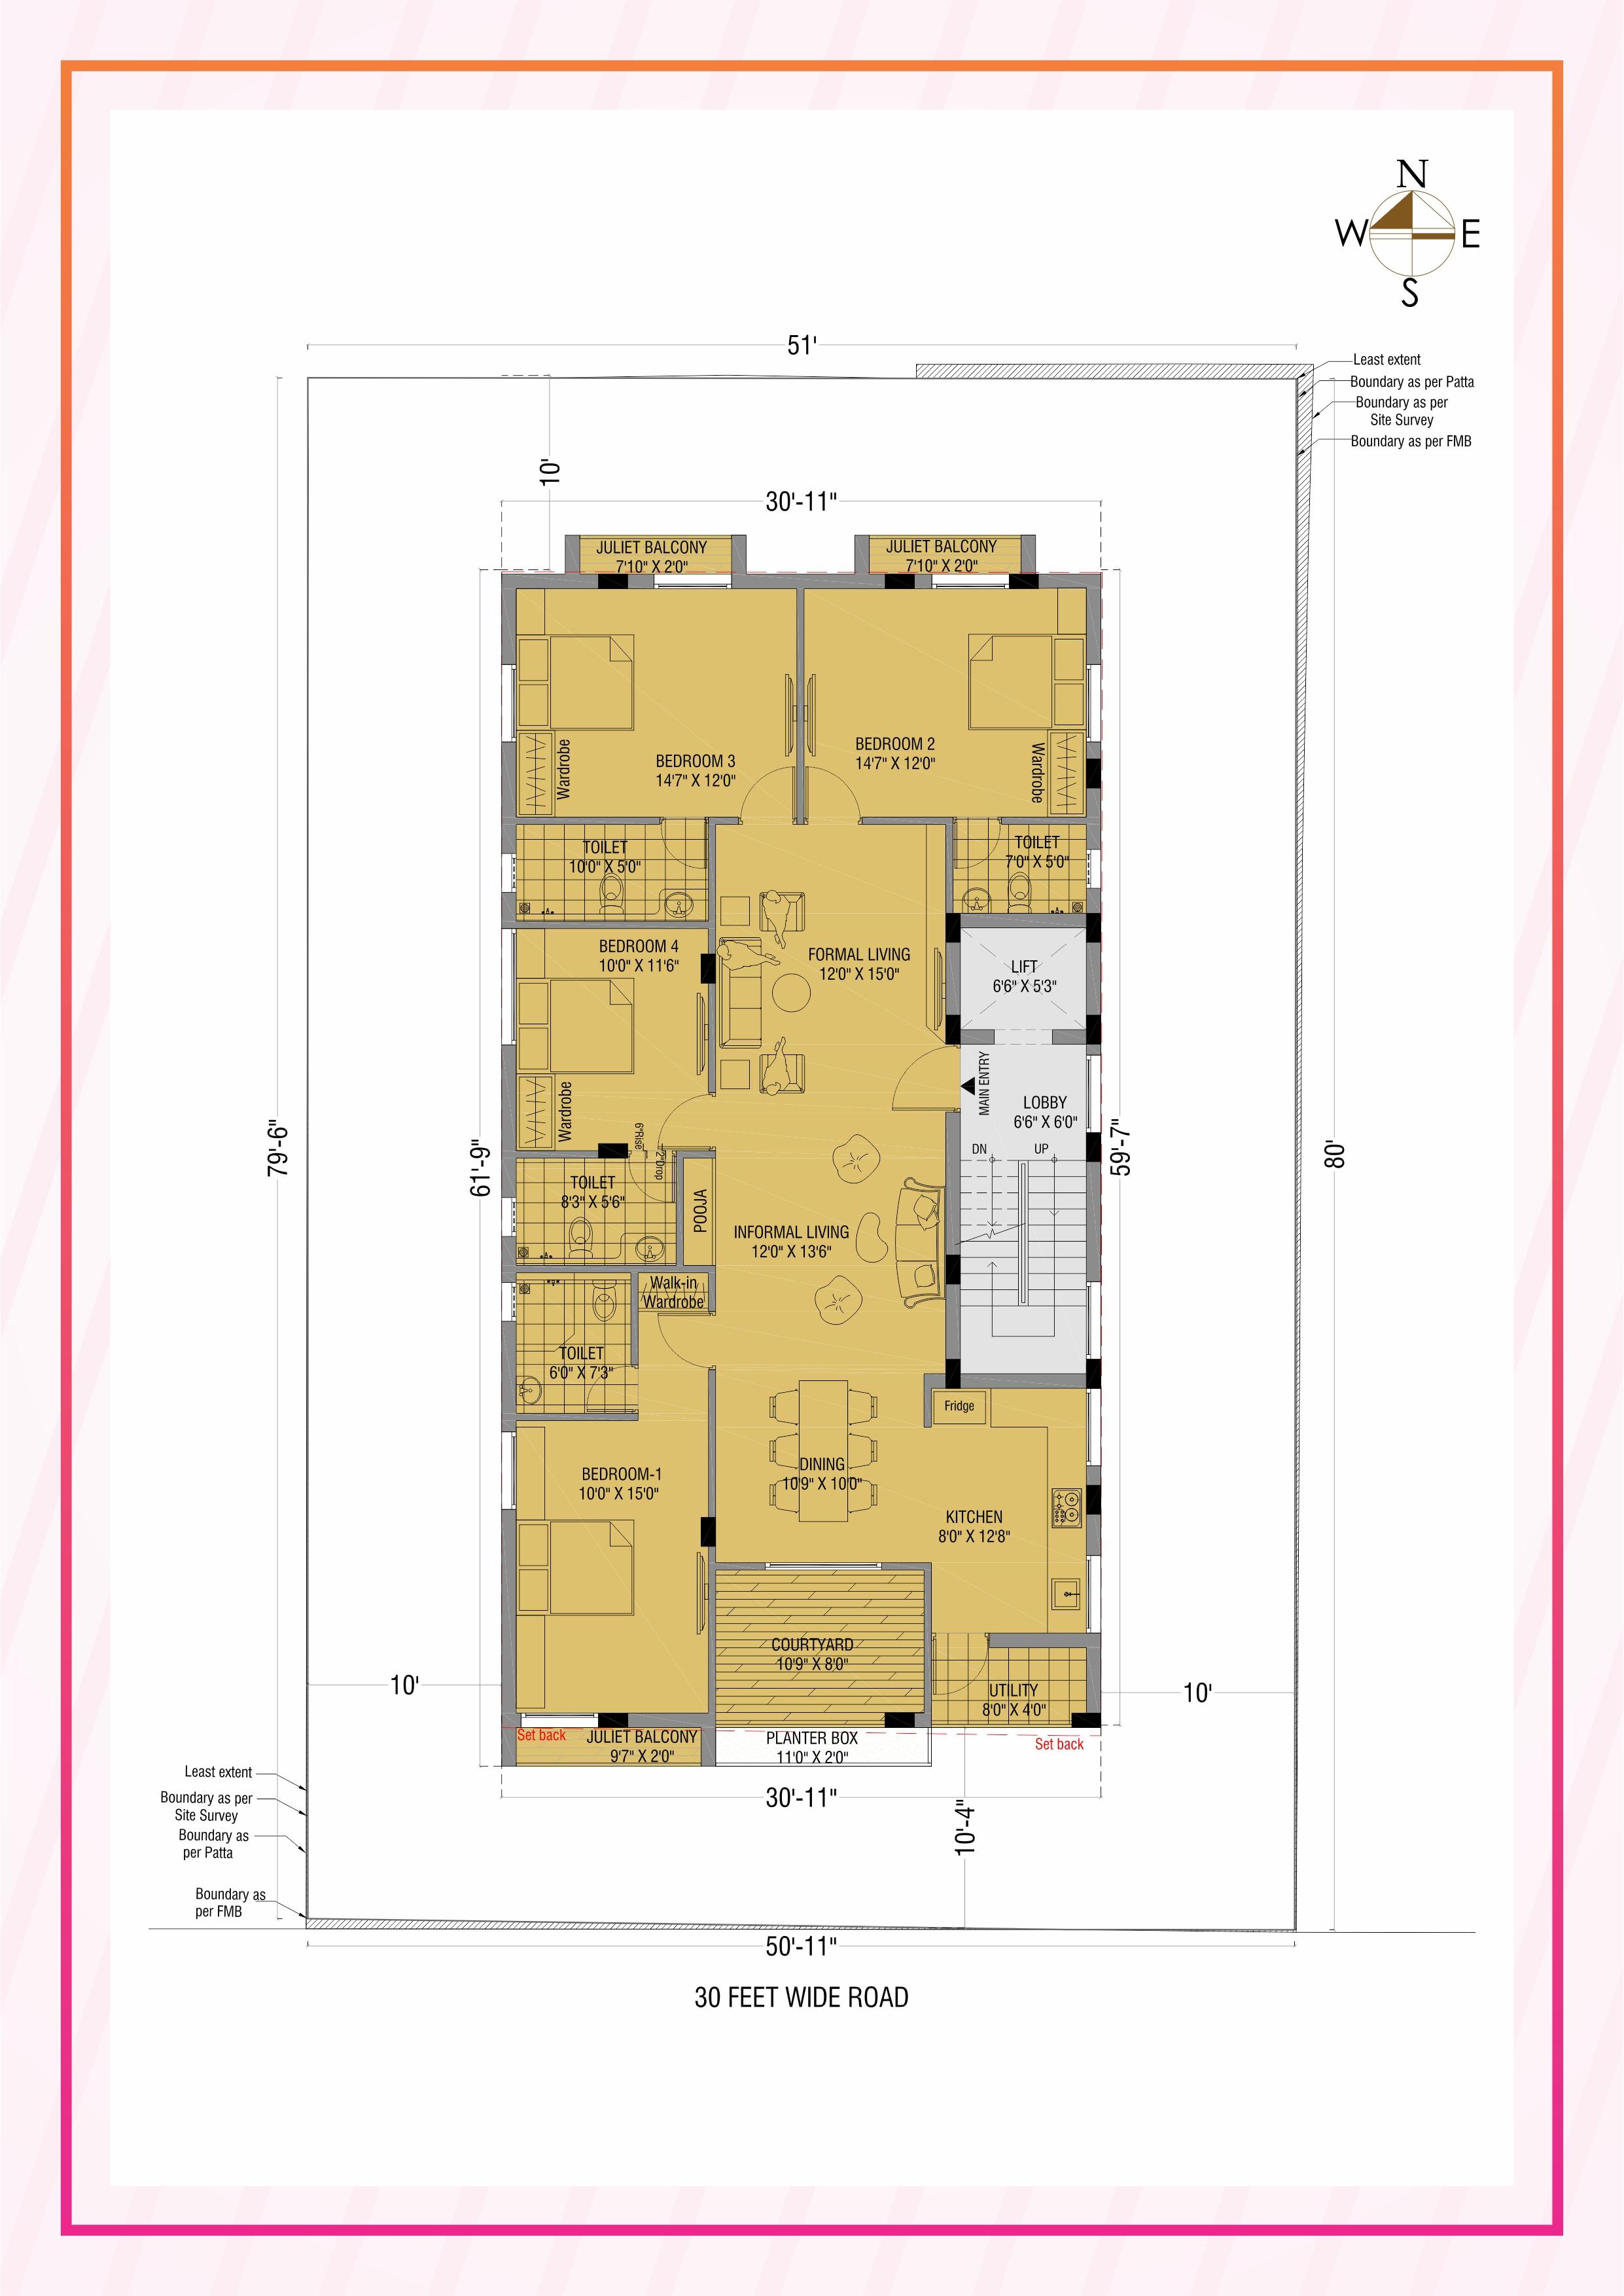 https://www.firmfoundations.in/projects/floorplans/thumbnails/15948115261Q_50_Floor_Pla.jpg